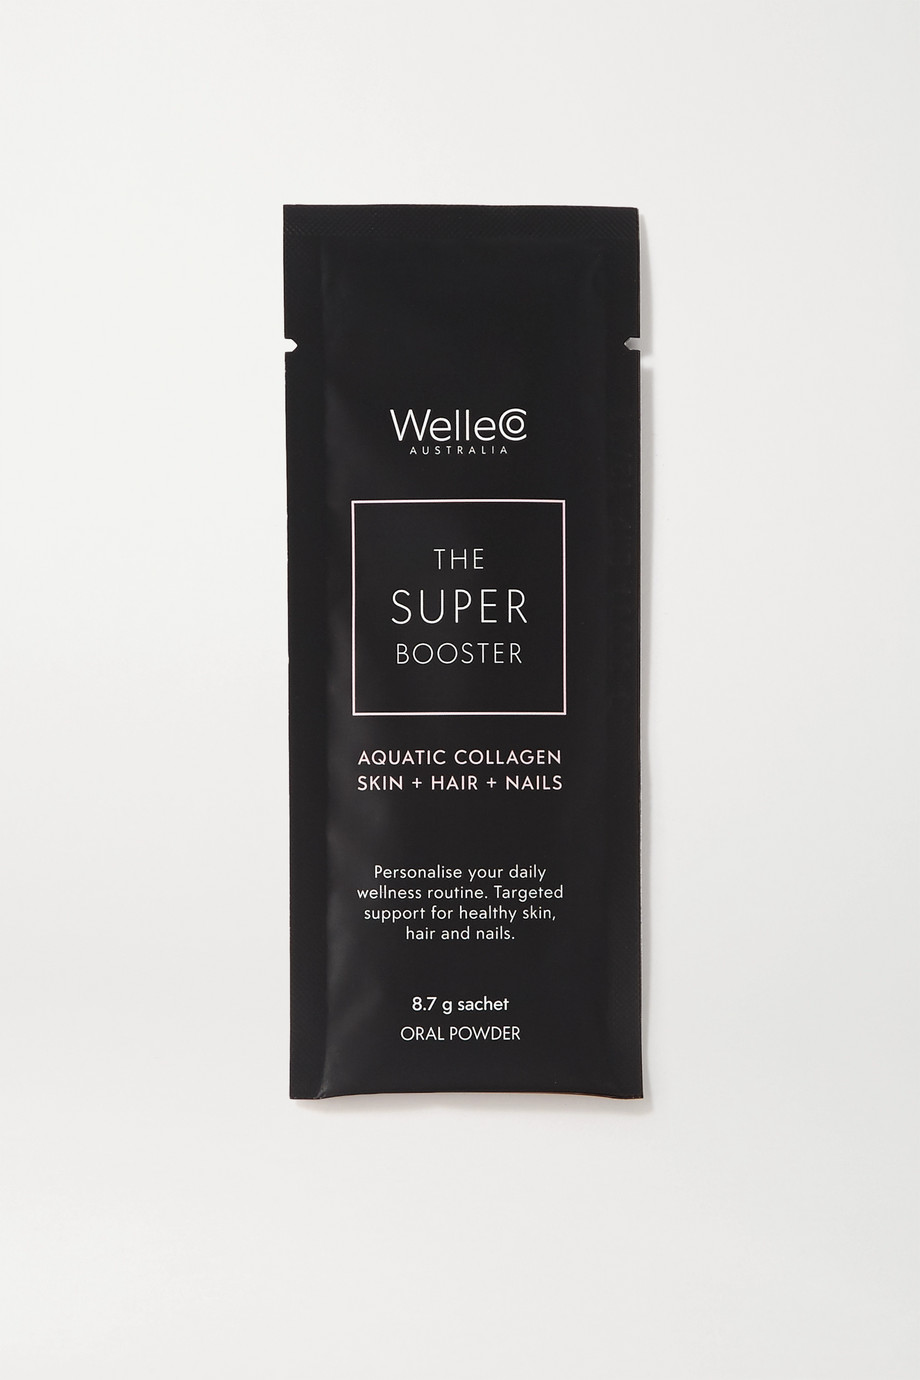 WelleCo The Super Booster - Aquatic Collagen Skin + Hair + Nails, 14 x 8.7g